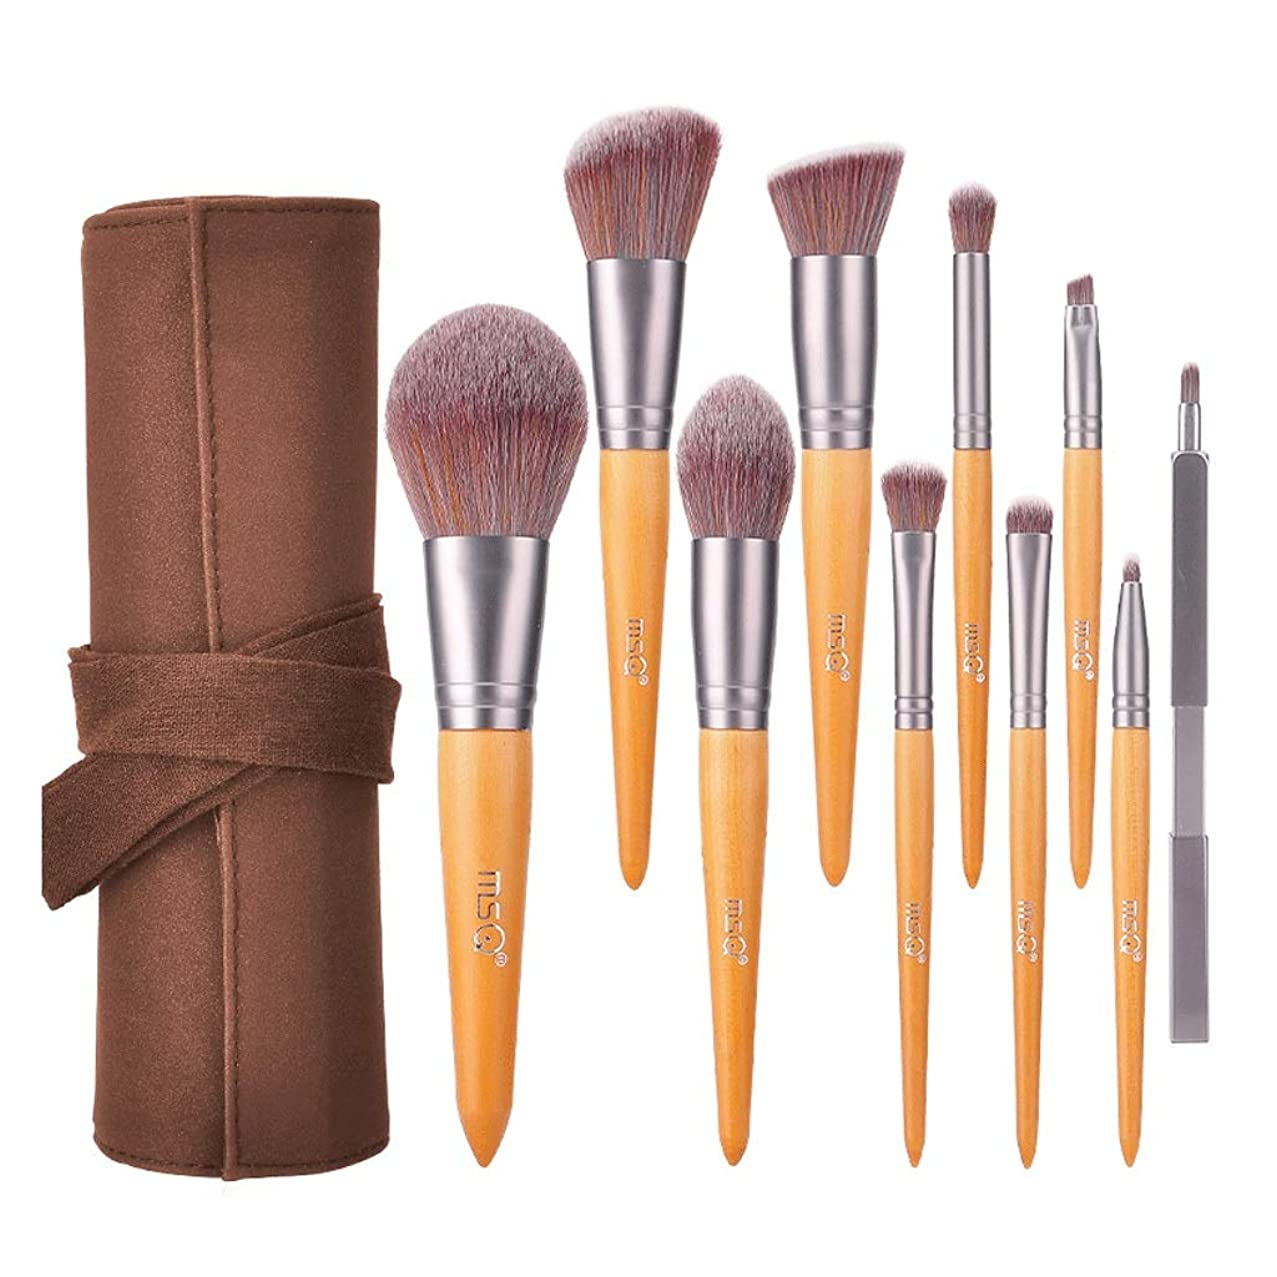 10 Makeup Brush Sets - Eyeshadow Mascara Foundation Liquid Foundation Concealer Brush Beginner Makeup Tool With Leather Storage Bag